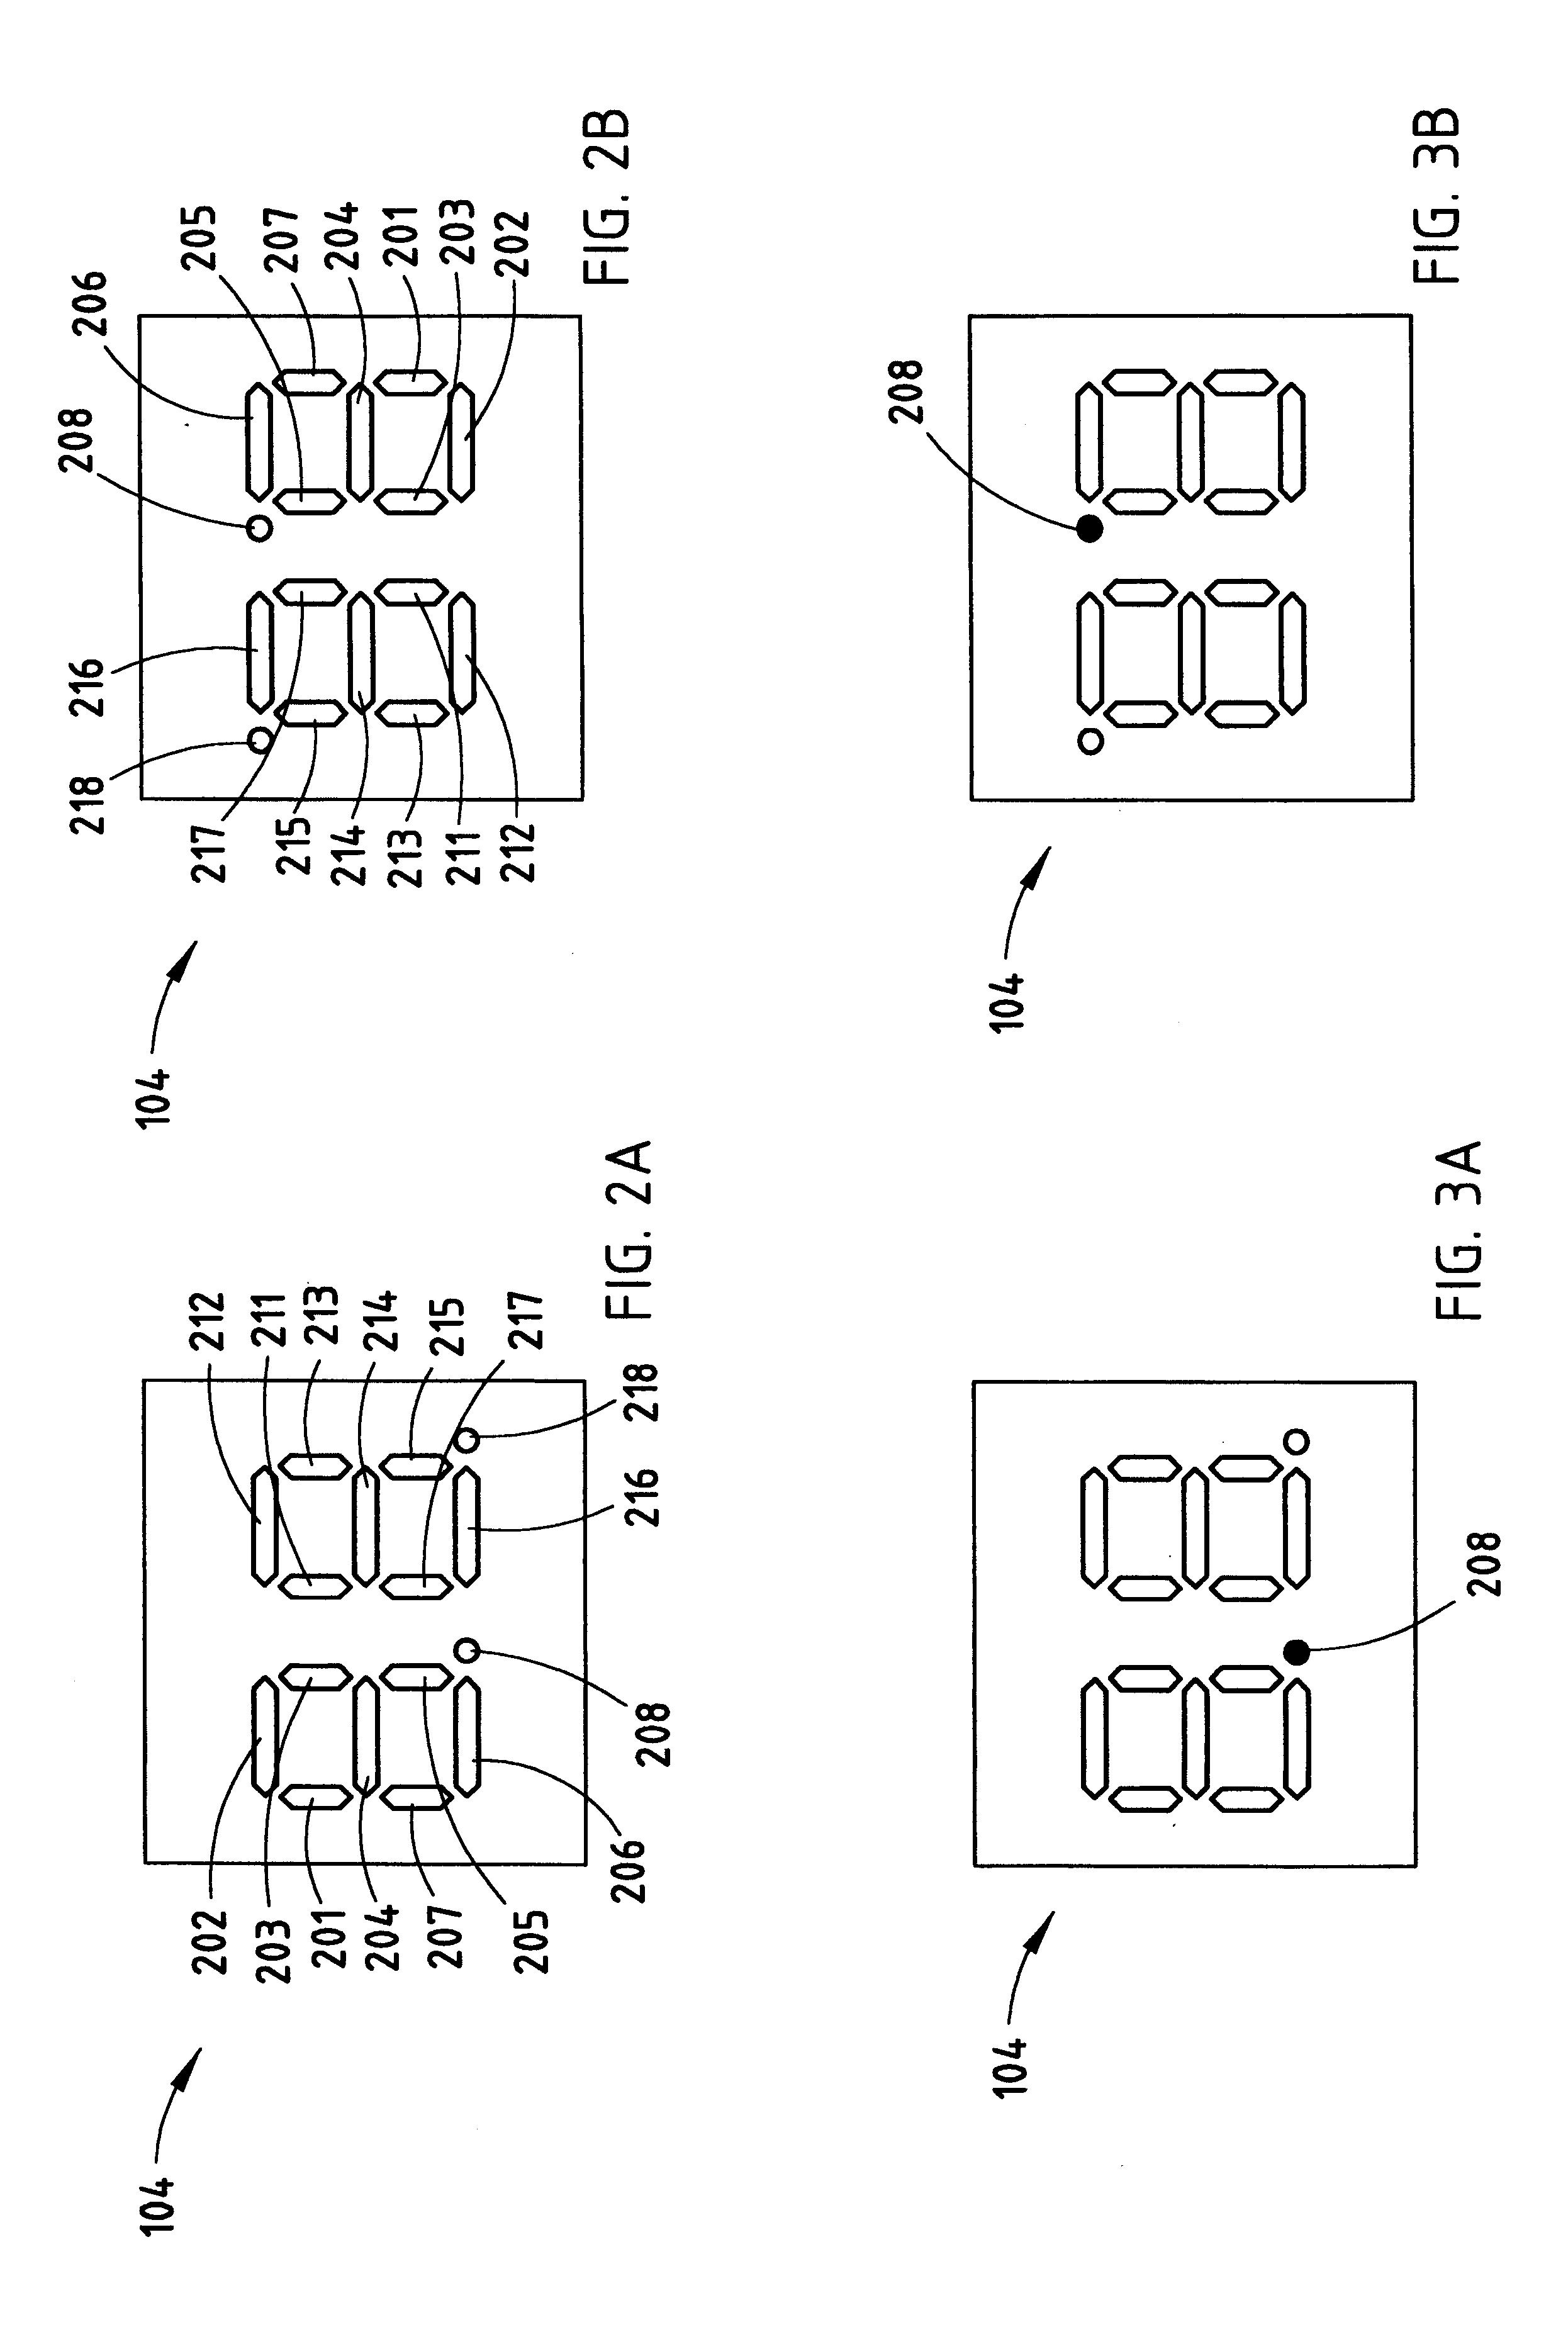 us d png hayman reese brake control wiring diagram wiring diagram 2492 x 3706